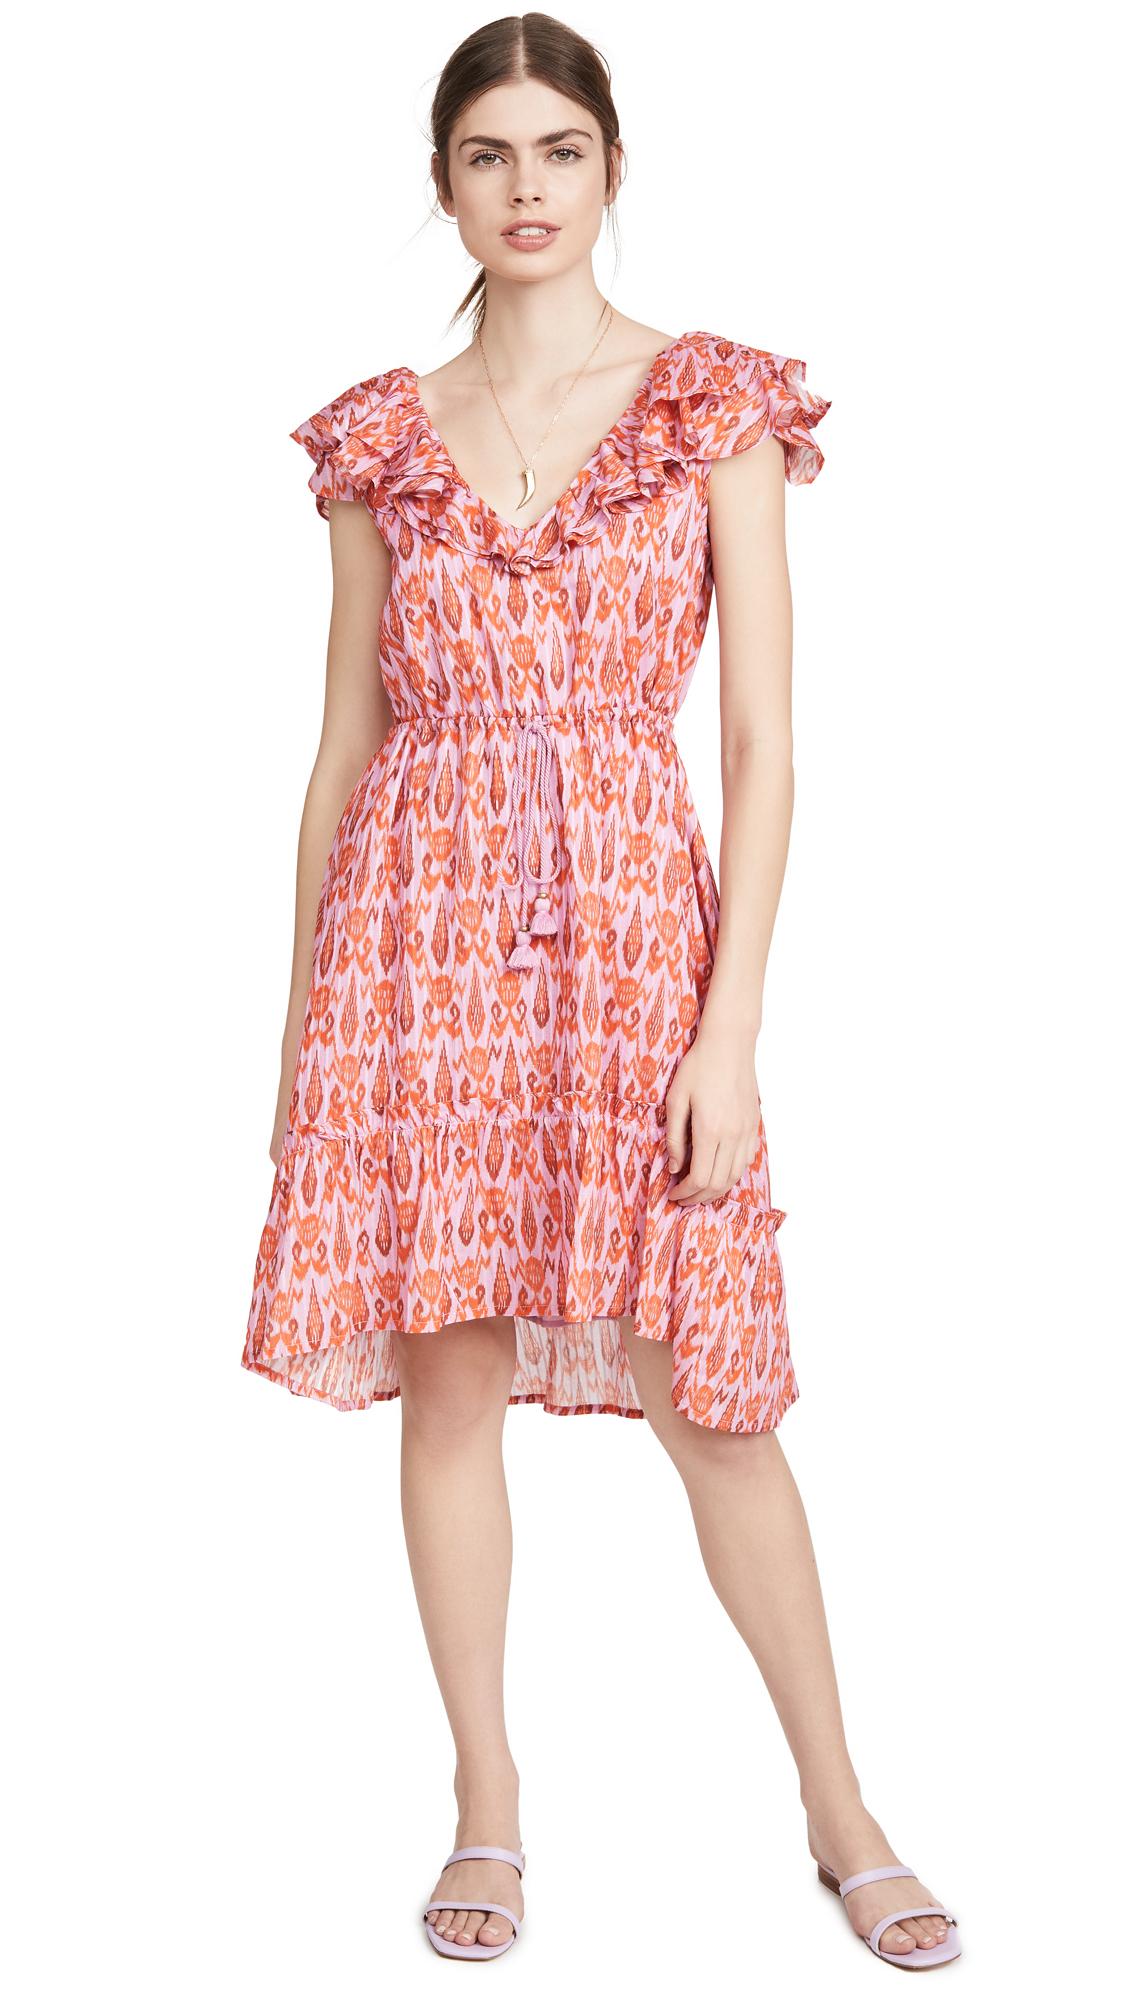 Figue Tahlia Dress - 60% Off Sale